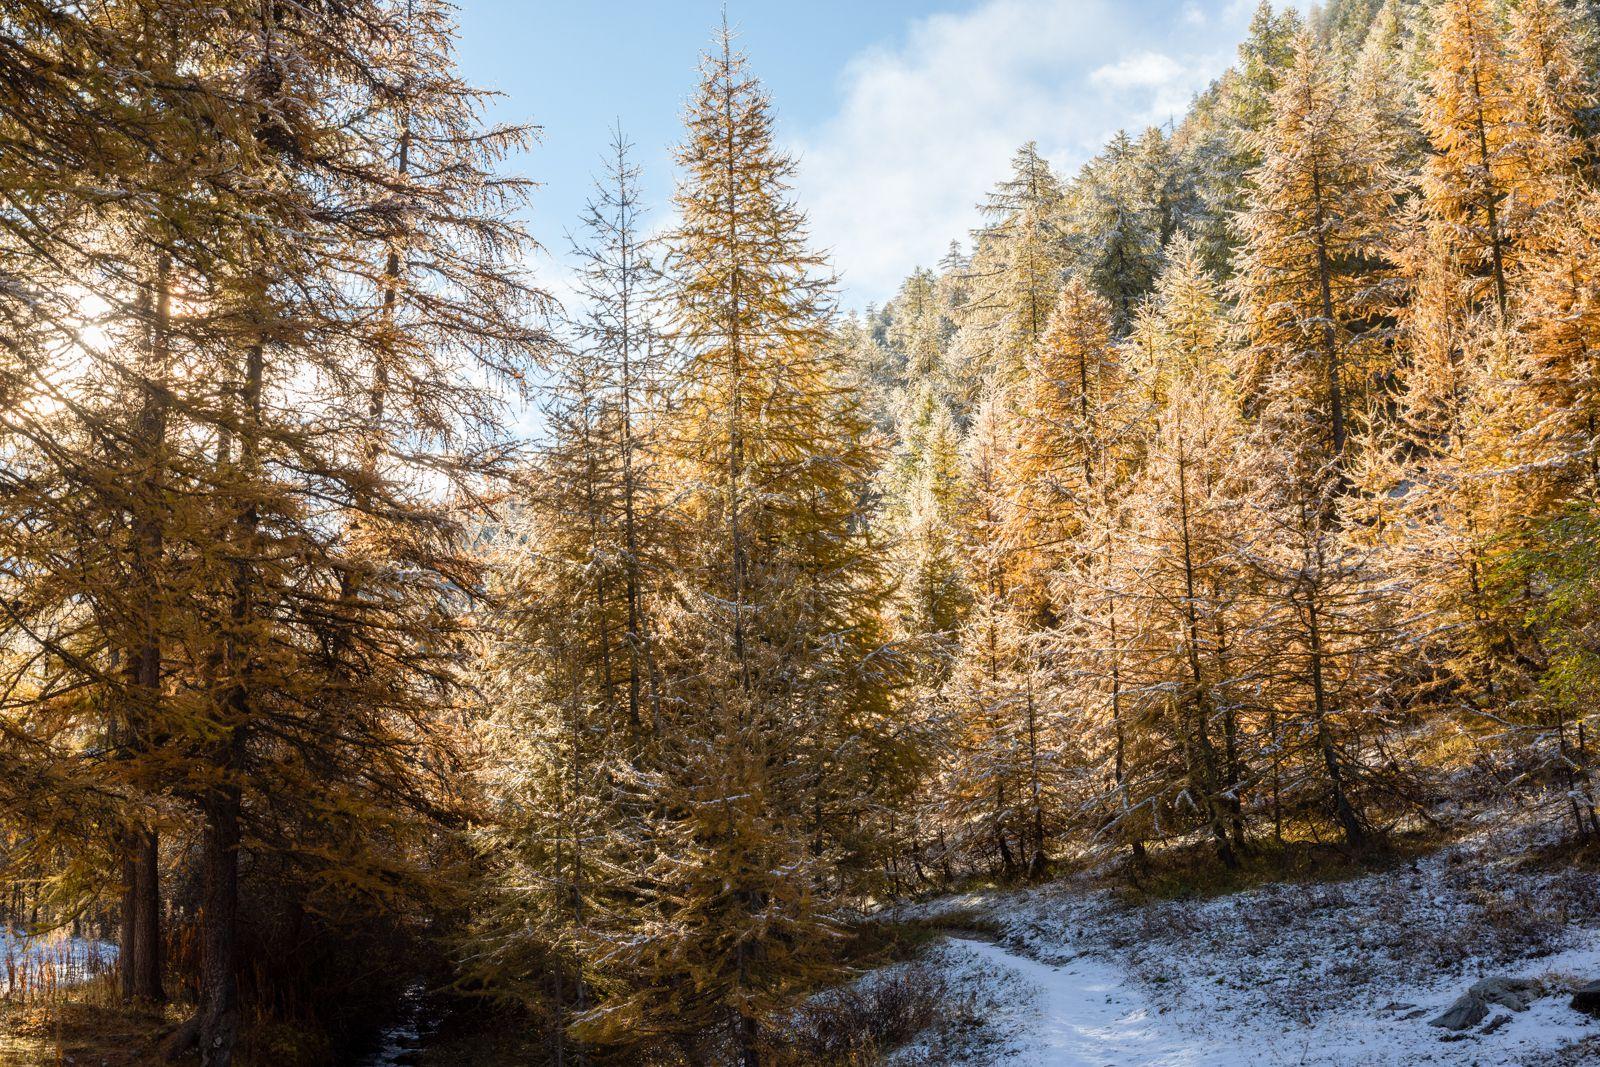 Queyras - vallée de Ceillac et lac miroir